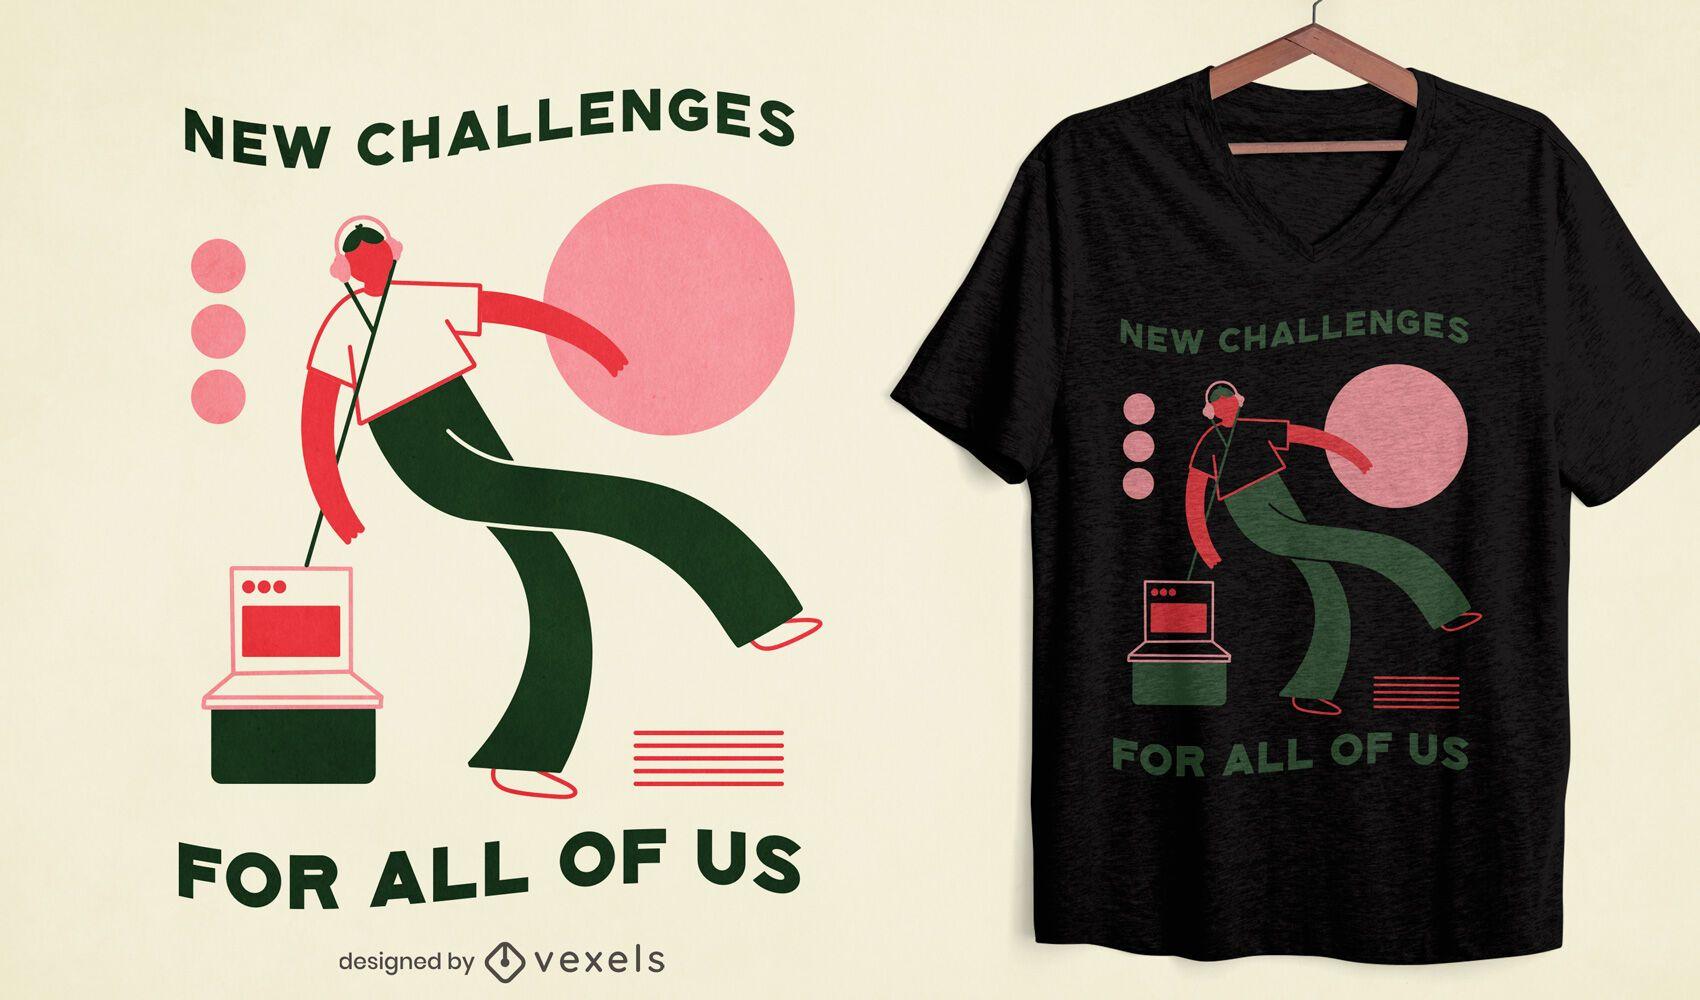 New challenges t-shirt design